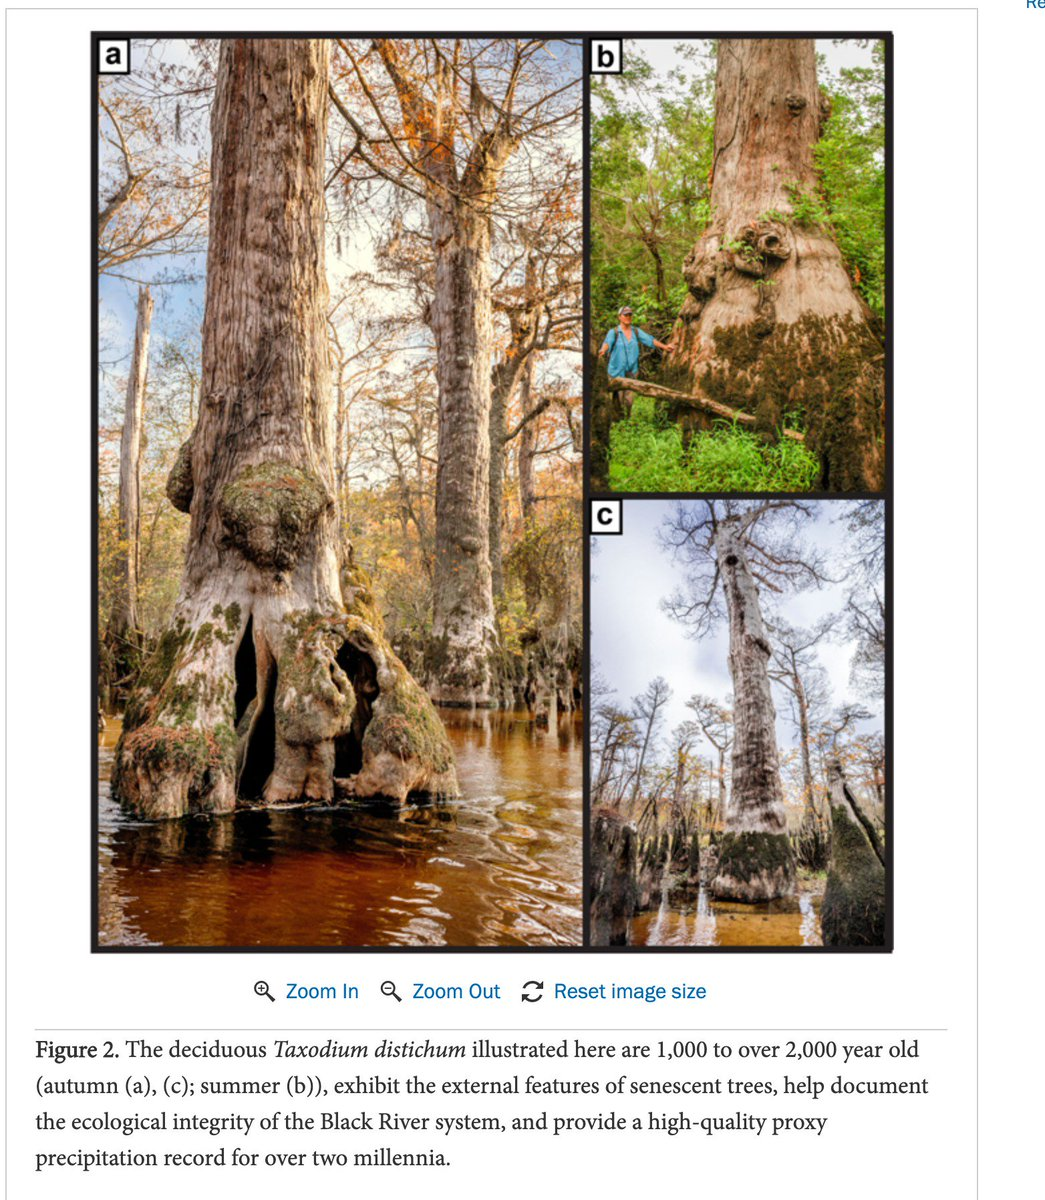 If these bald cypress can survive more than 2,000 years of climatic change and anthropogenic impacts, you can survive finals week. You got this, 'Jacks!  https://www.newsweek.com/2624-tree-north-carolina-swamp-oldest-planet-1421844?fbclid=IwAR2ai1QwHtDlxr2nn24SQUR0Pjx5RwoIIu-XnkKQi72HES5mQXRzOjWyHqI…  #TreeWisdom #Taxodium #FinalsWeek #ATCOFA